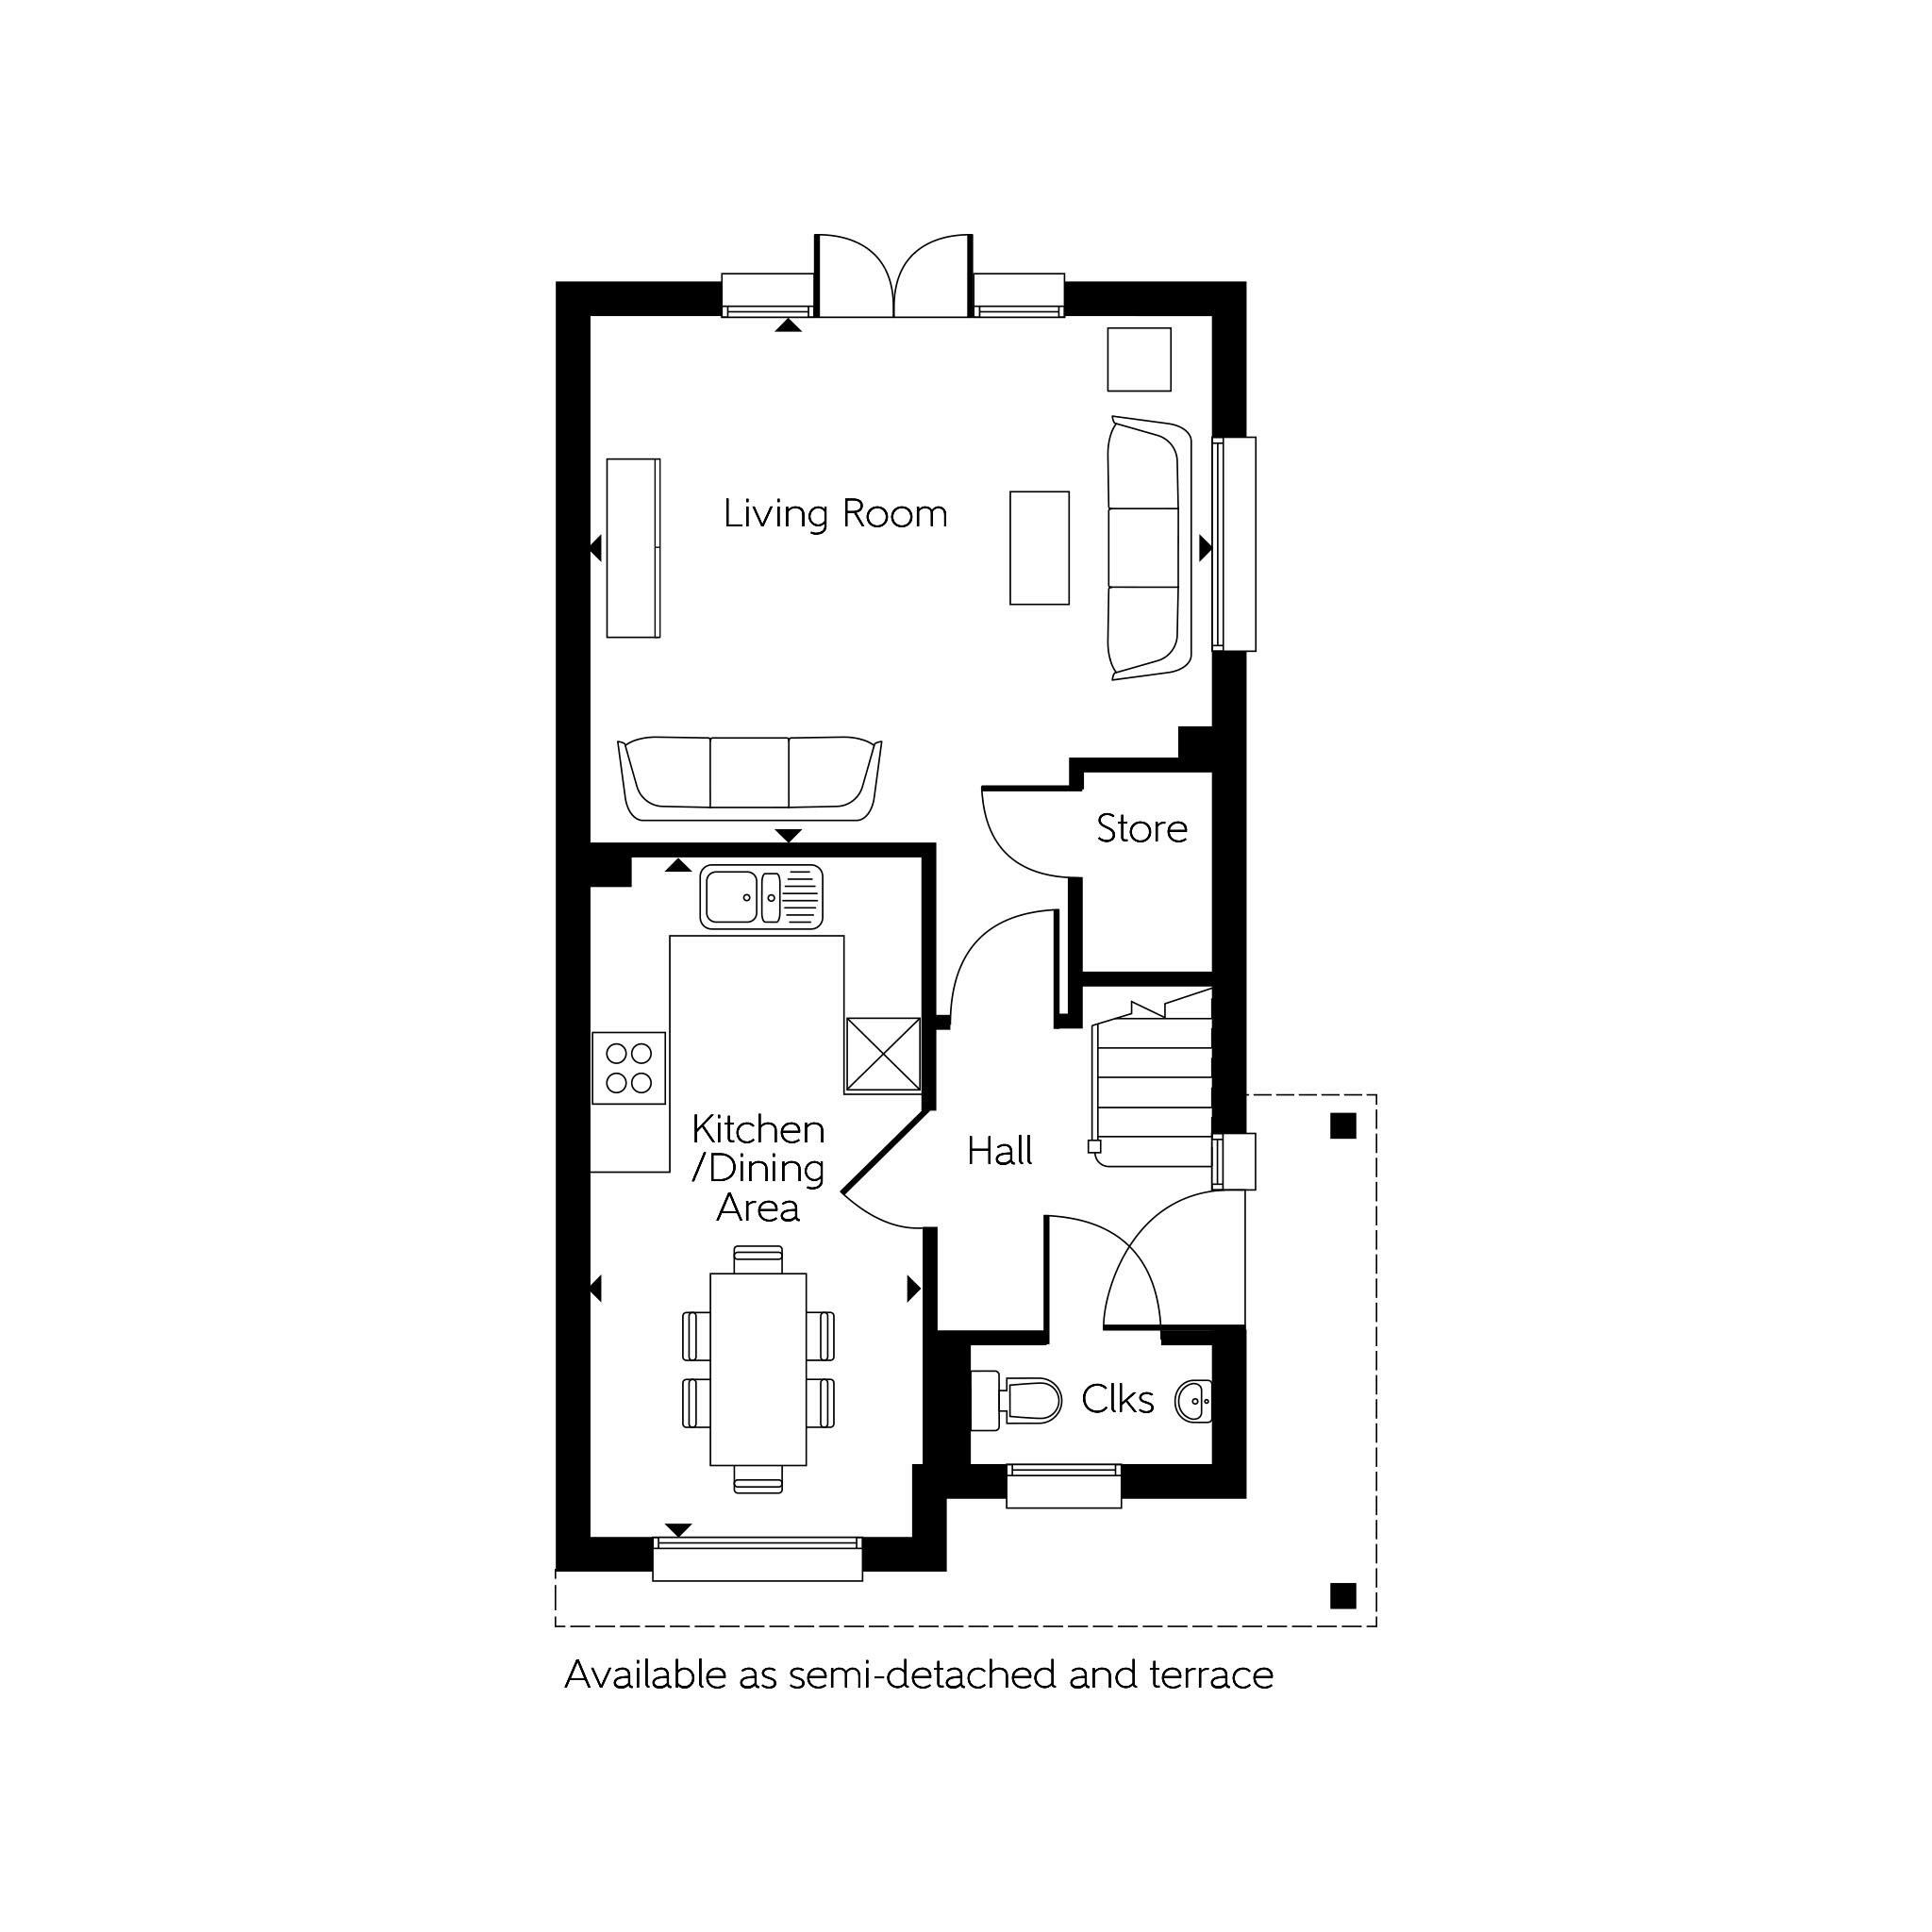 Bellway At Qeii Howlands Welwyn Garden City Al7 4 Bedroom Semi Detached House For Sale